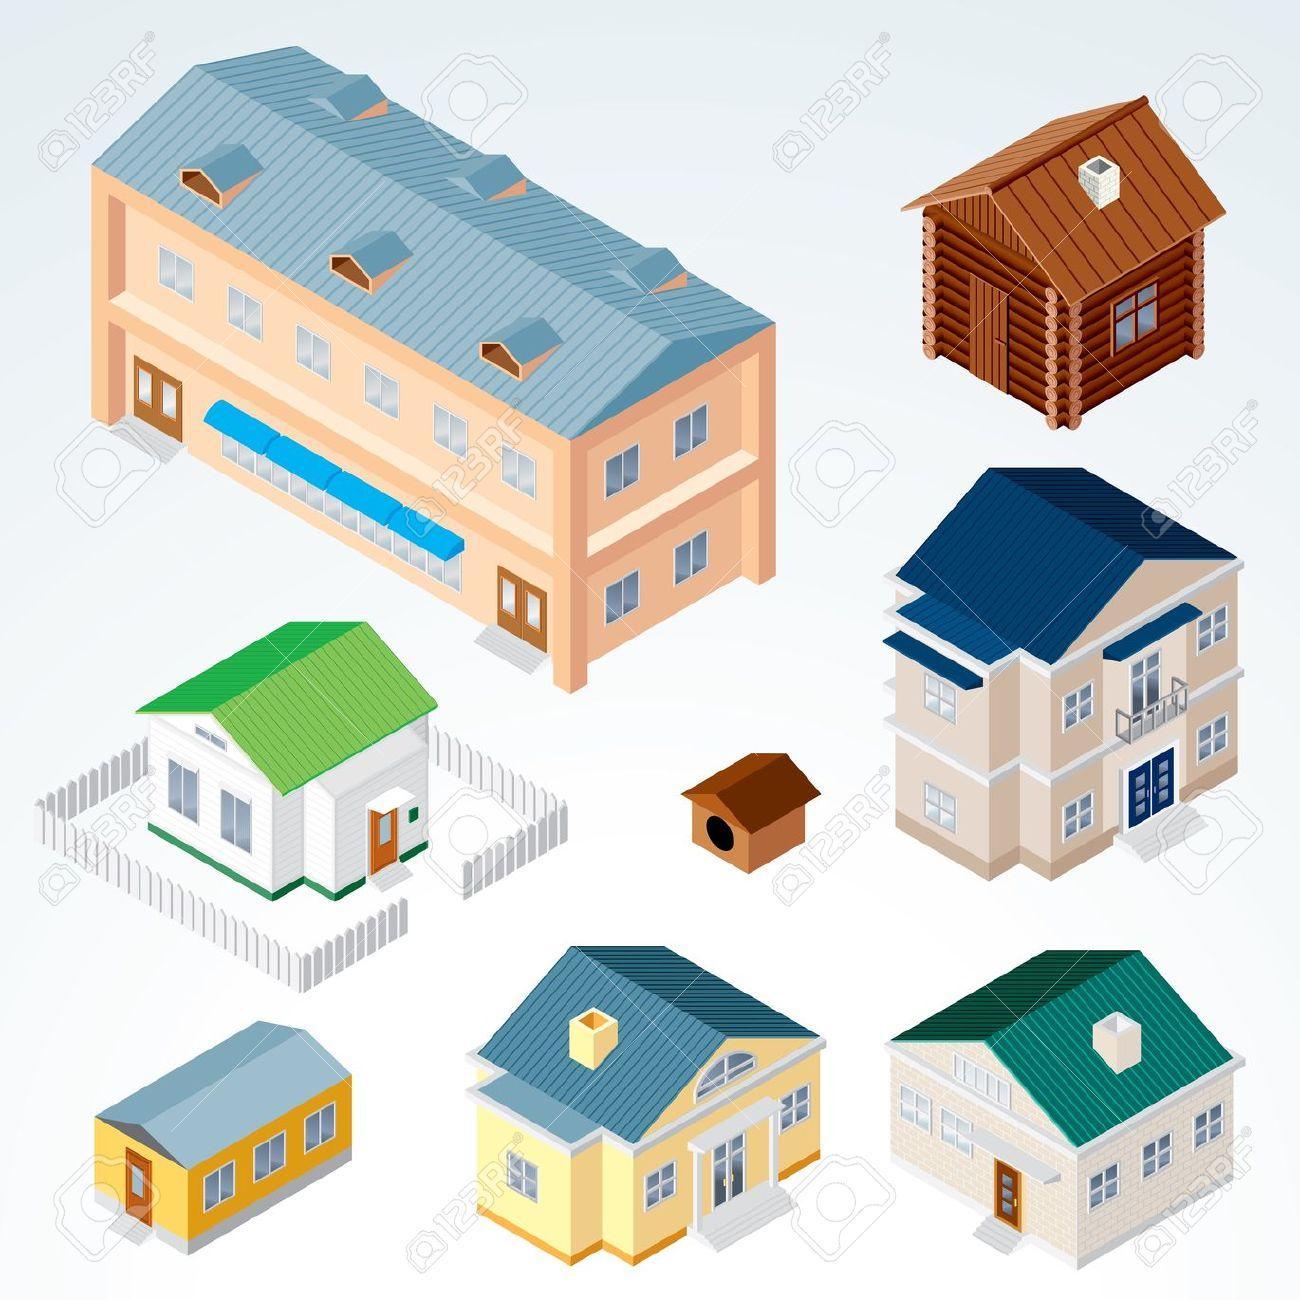 Dwellings Clipart